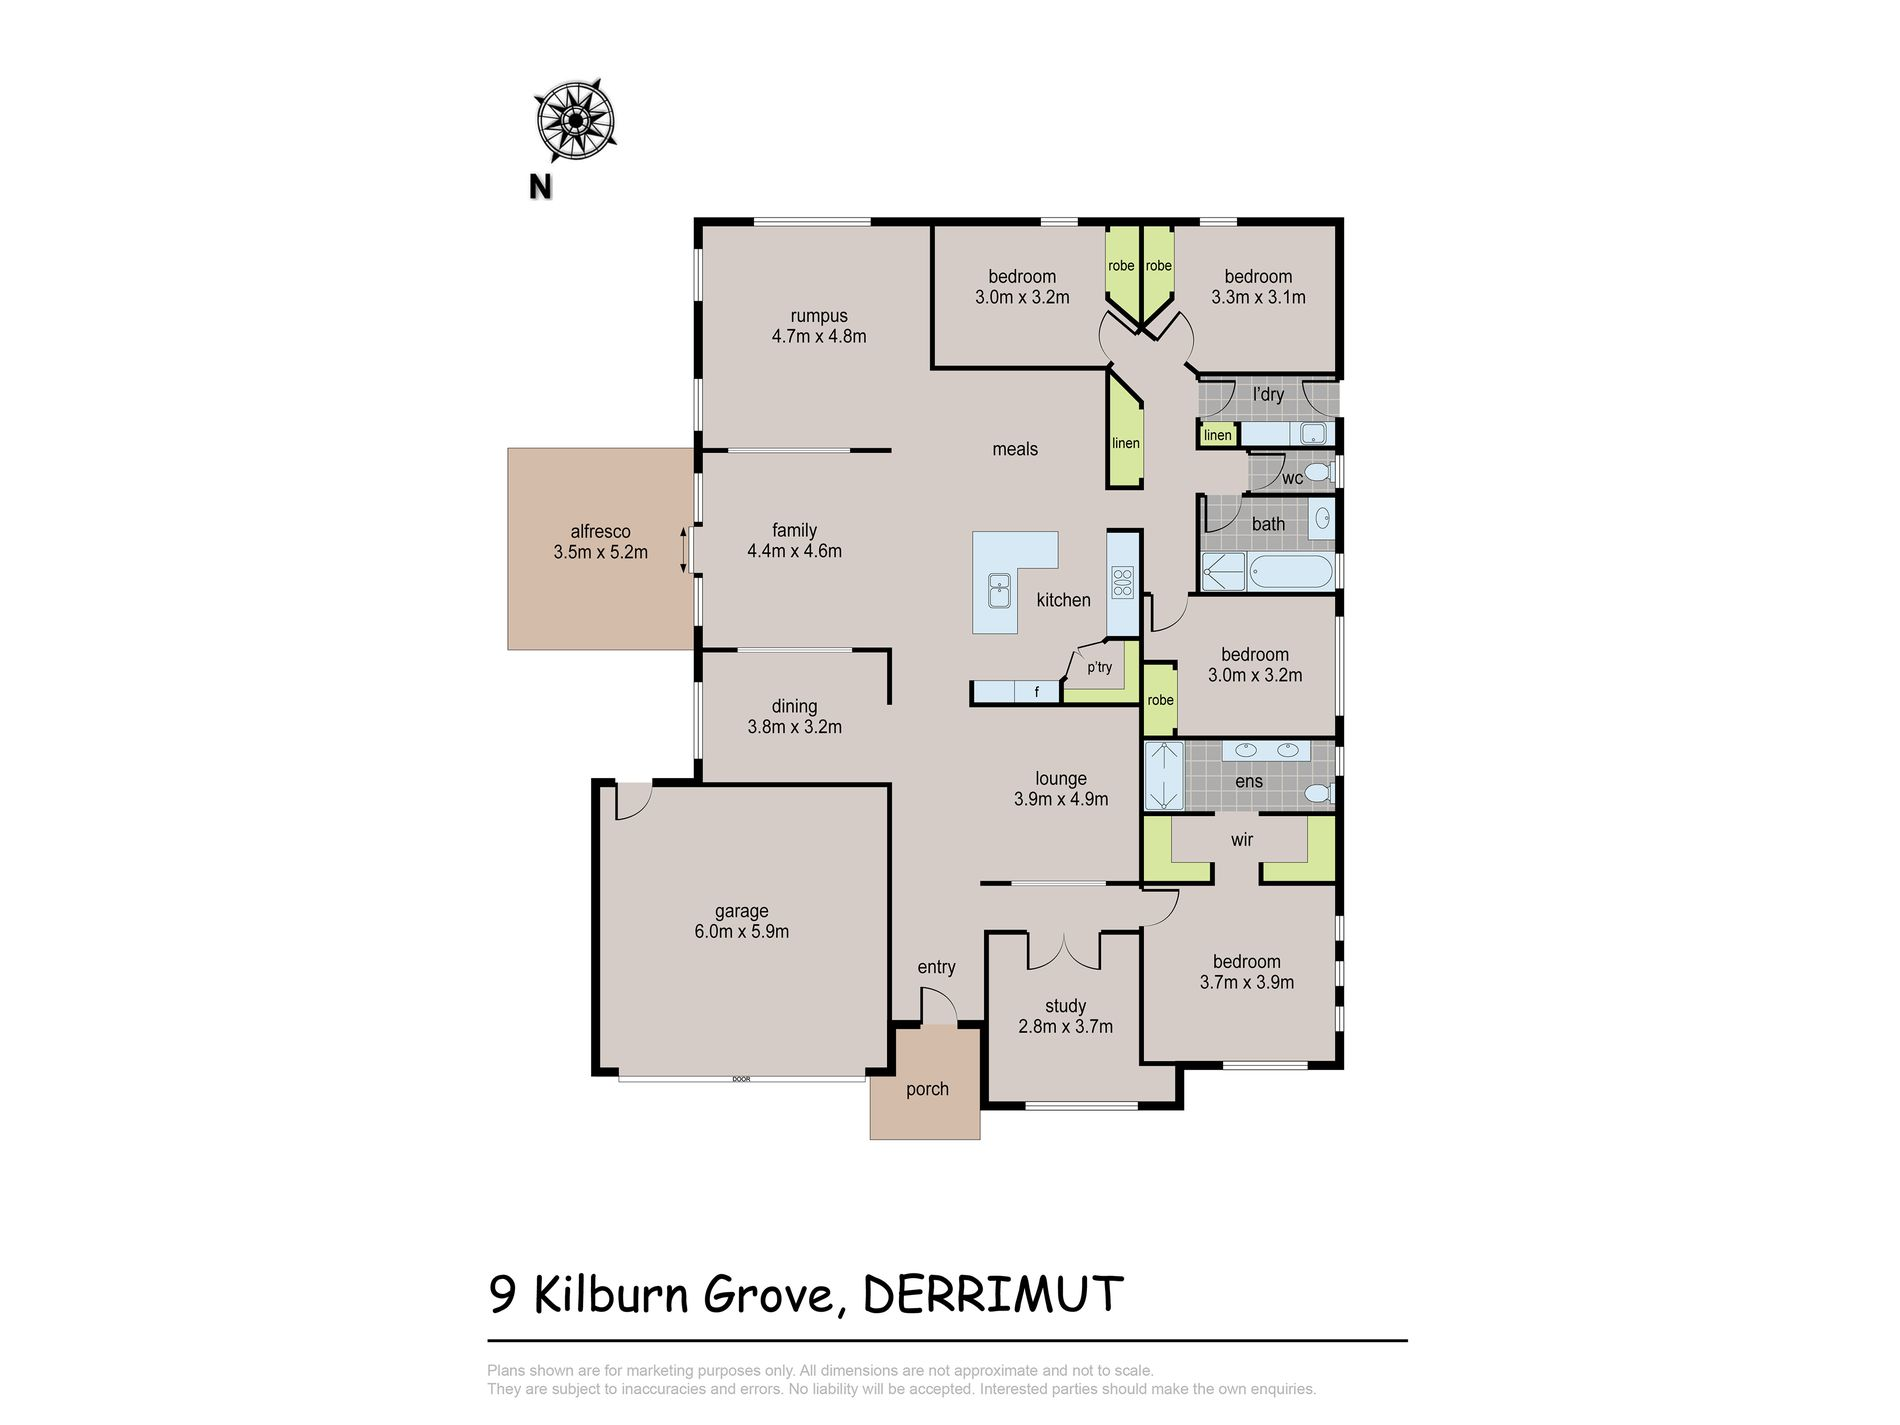 9 Kilburn Grove, Derrimut